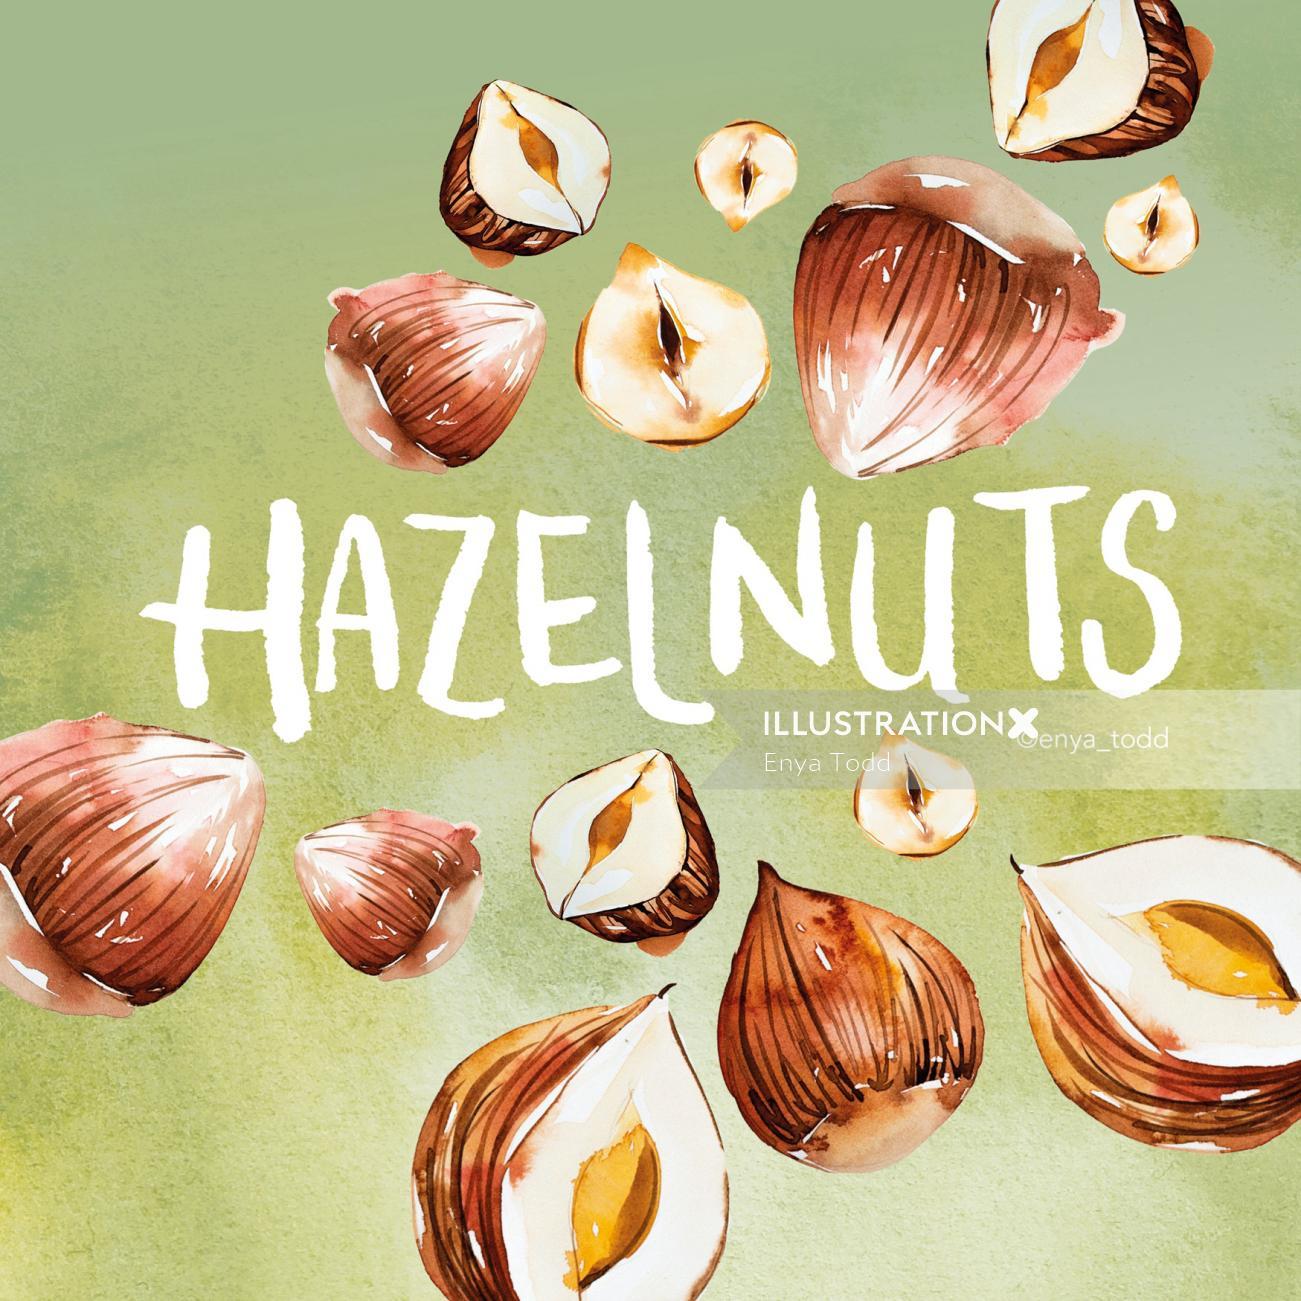 Illustration of Hazelnuts